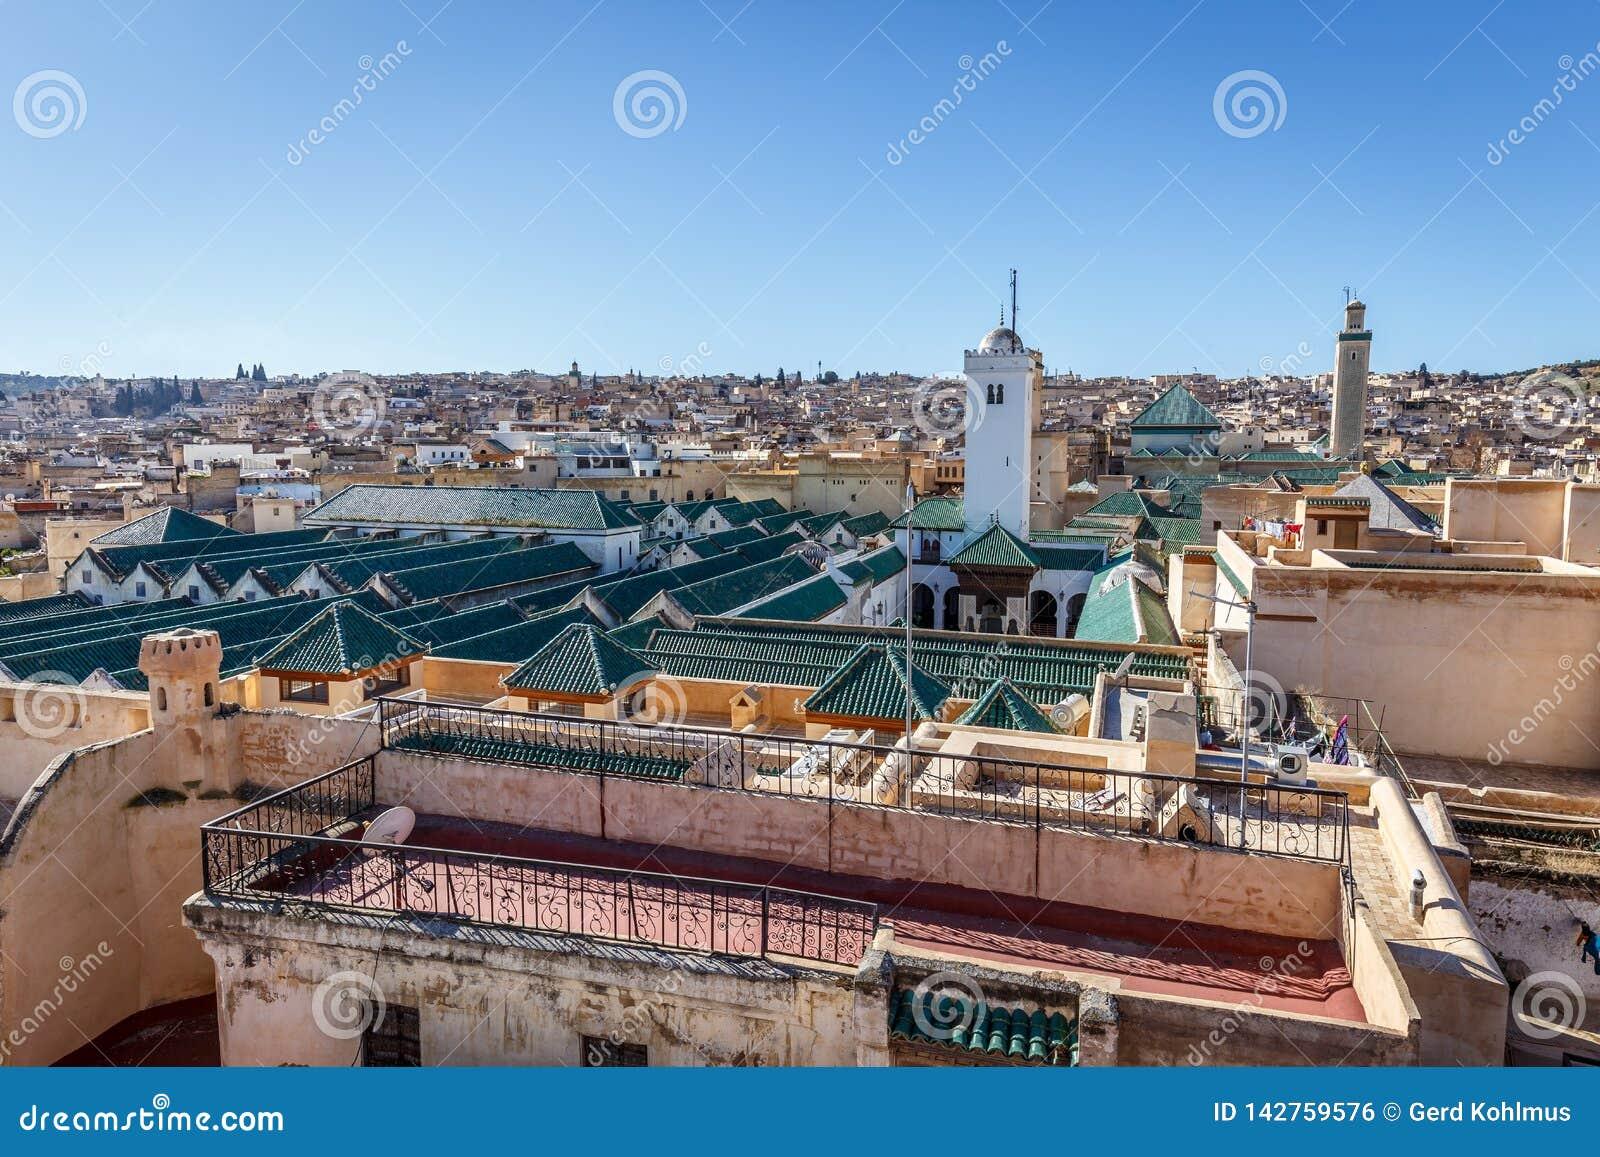 University Of Al-Karaouine In Fez, Morocco Stock Photo